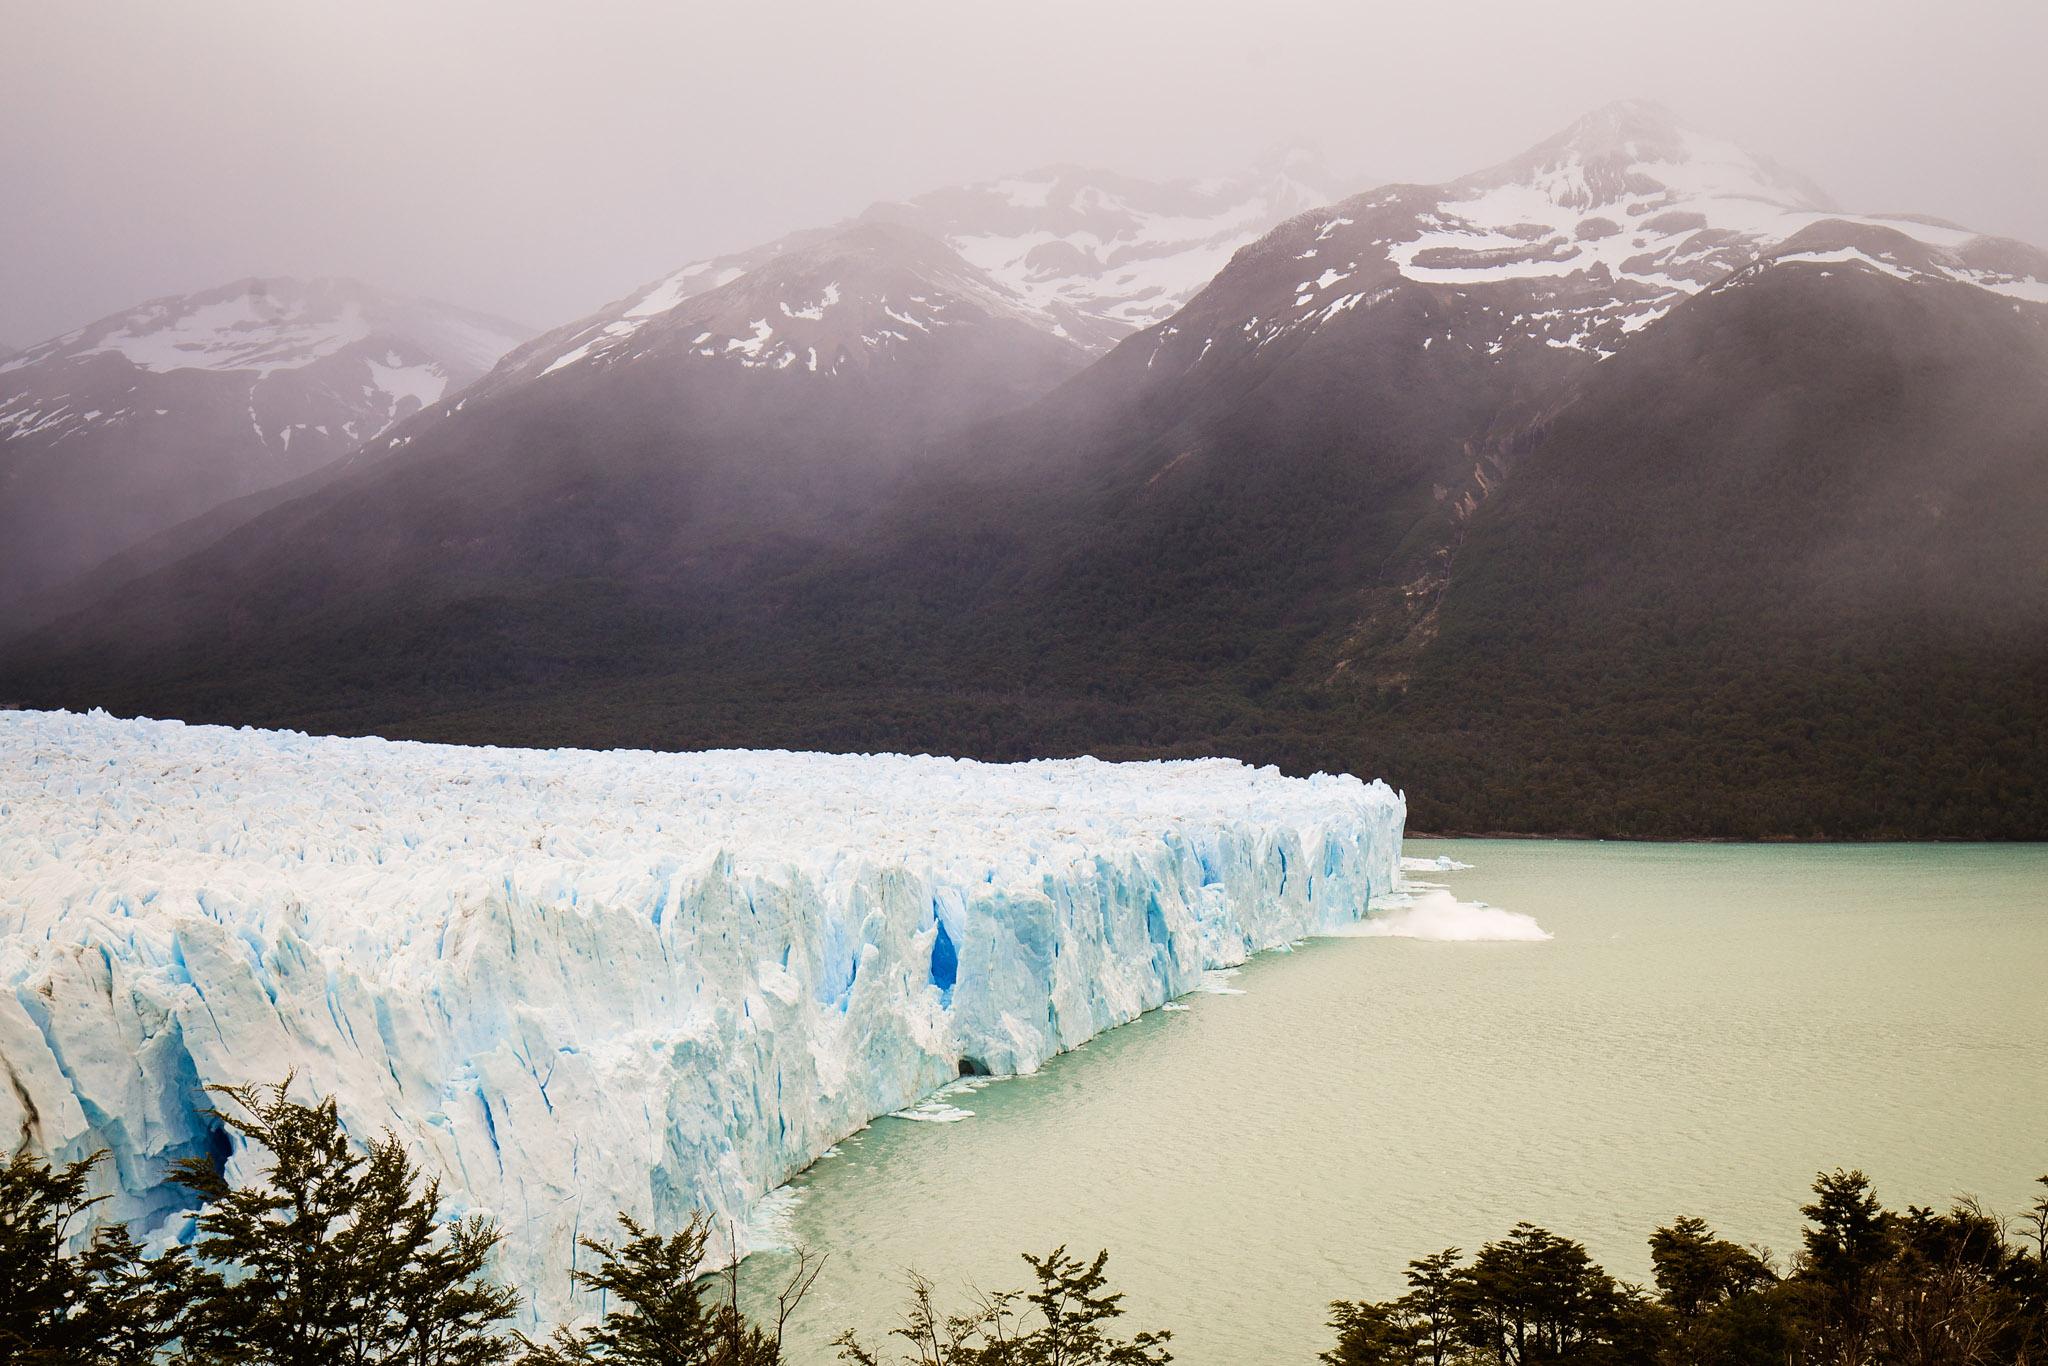 Wedding-Travellers-Overlanding-Destination-Wedding-Chile-Patagonia-Glacier-Perito-Moreno-ice